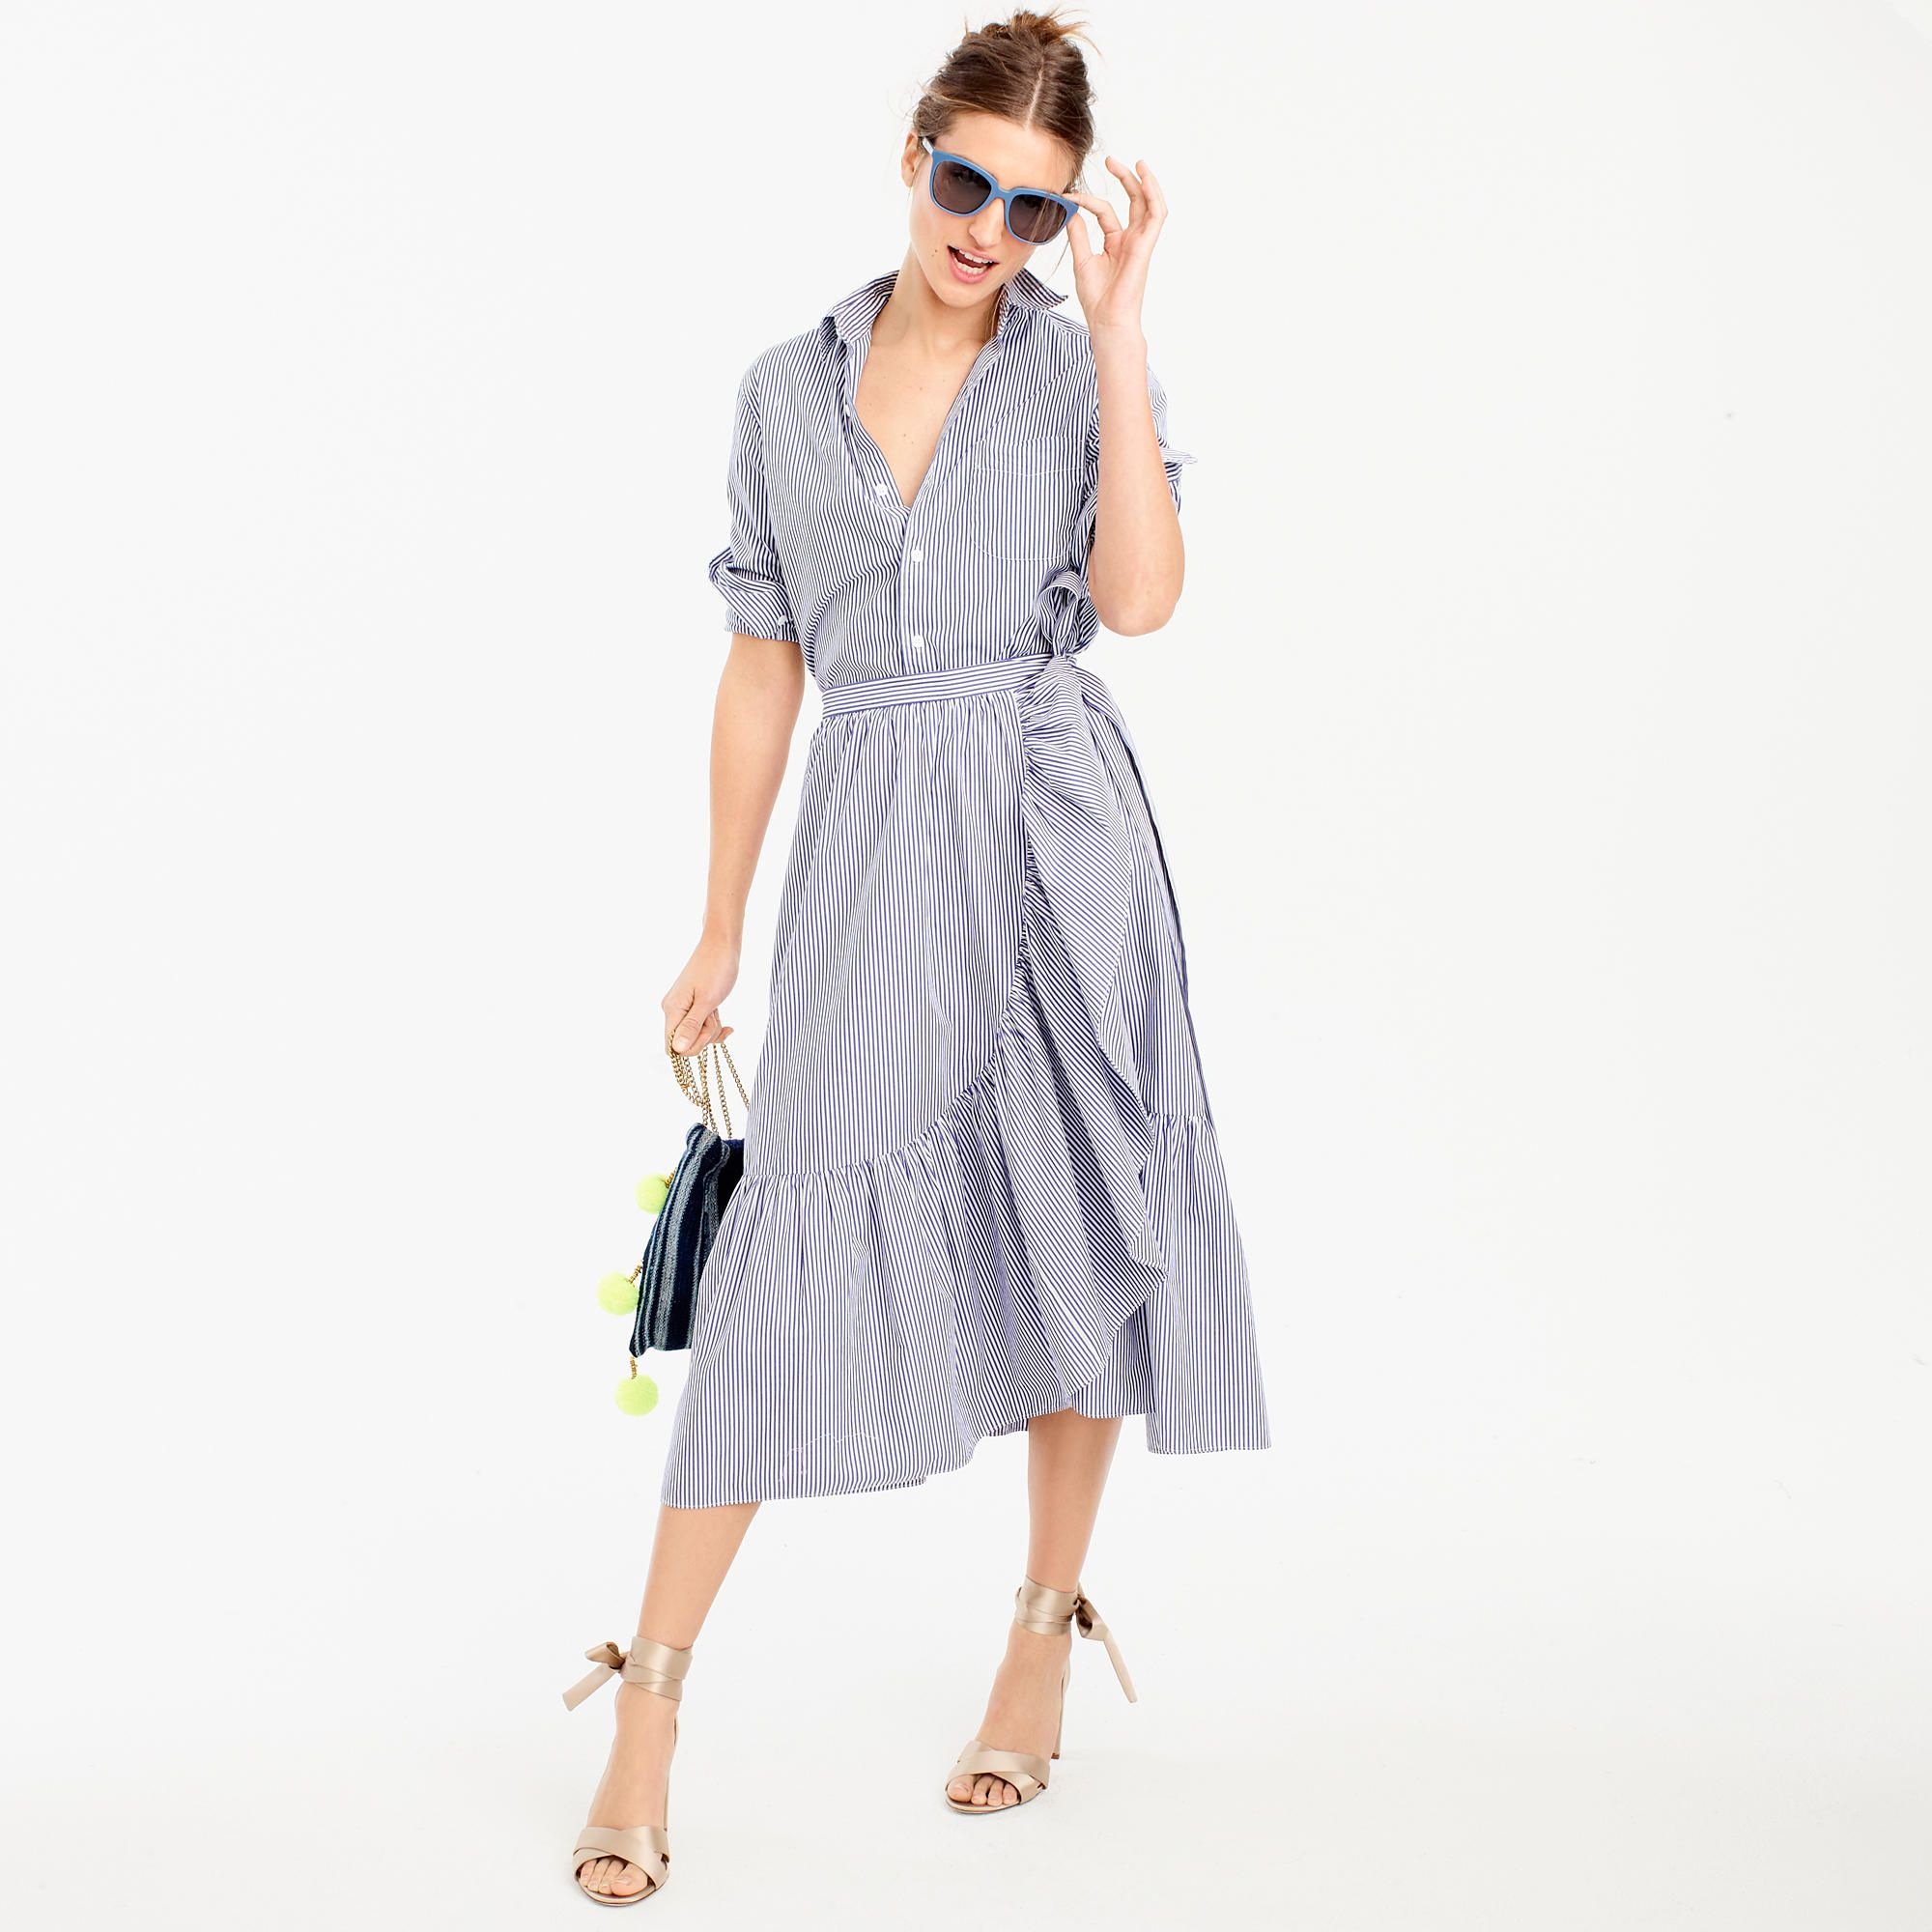 Ruffle wrap skirt in shirting stripe | Pinterest | Ruffles, Wraps ...